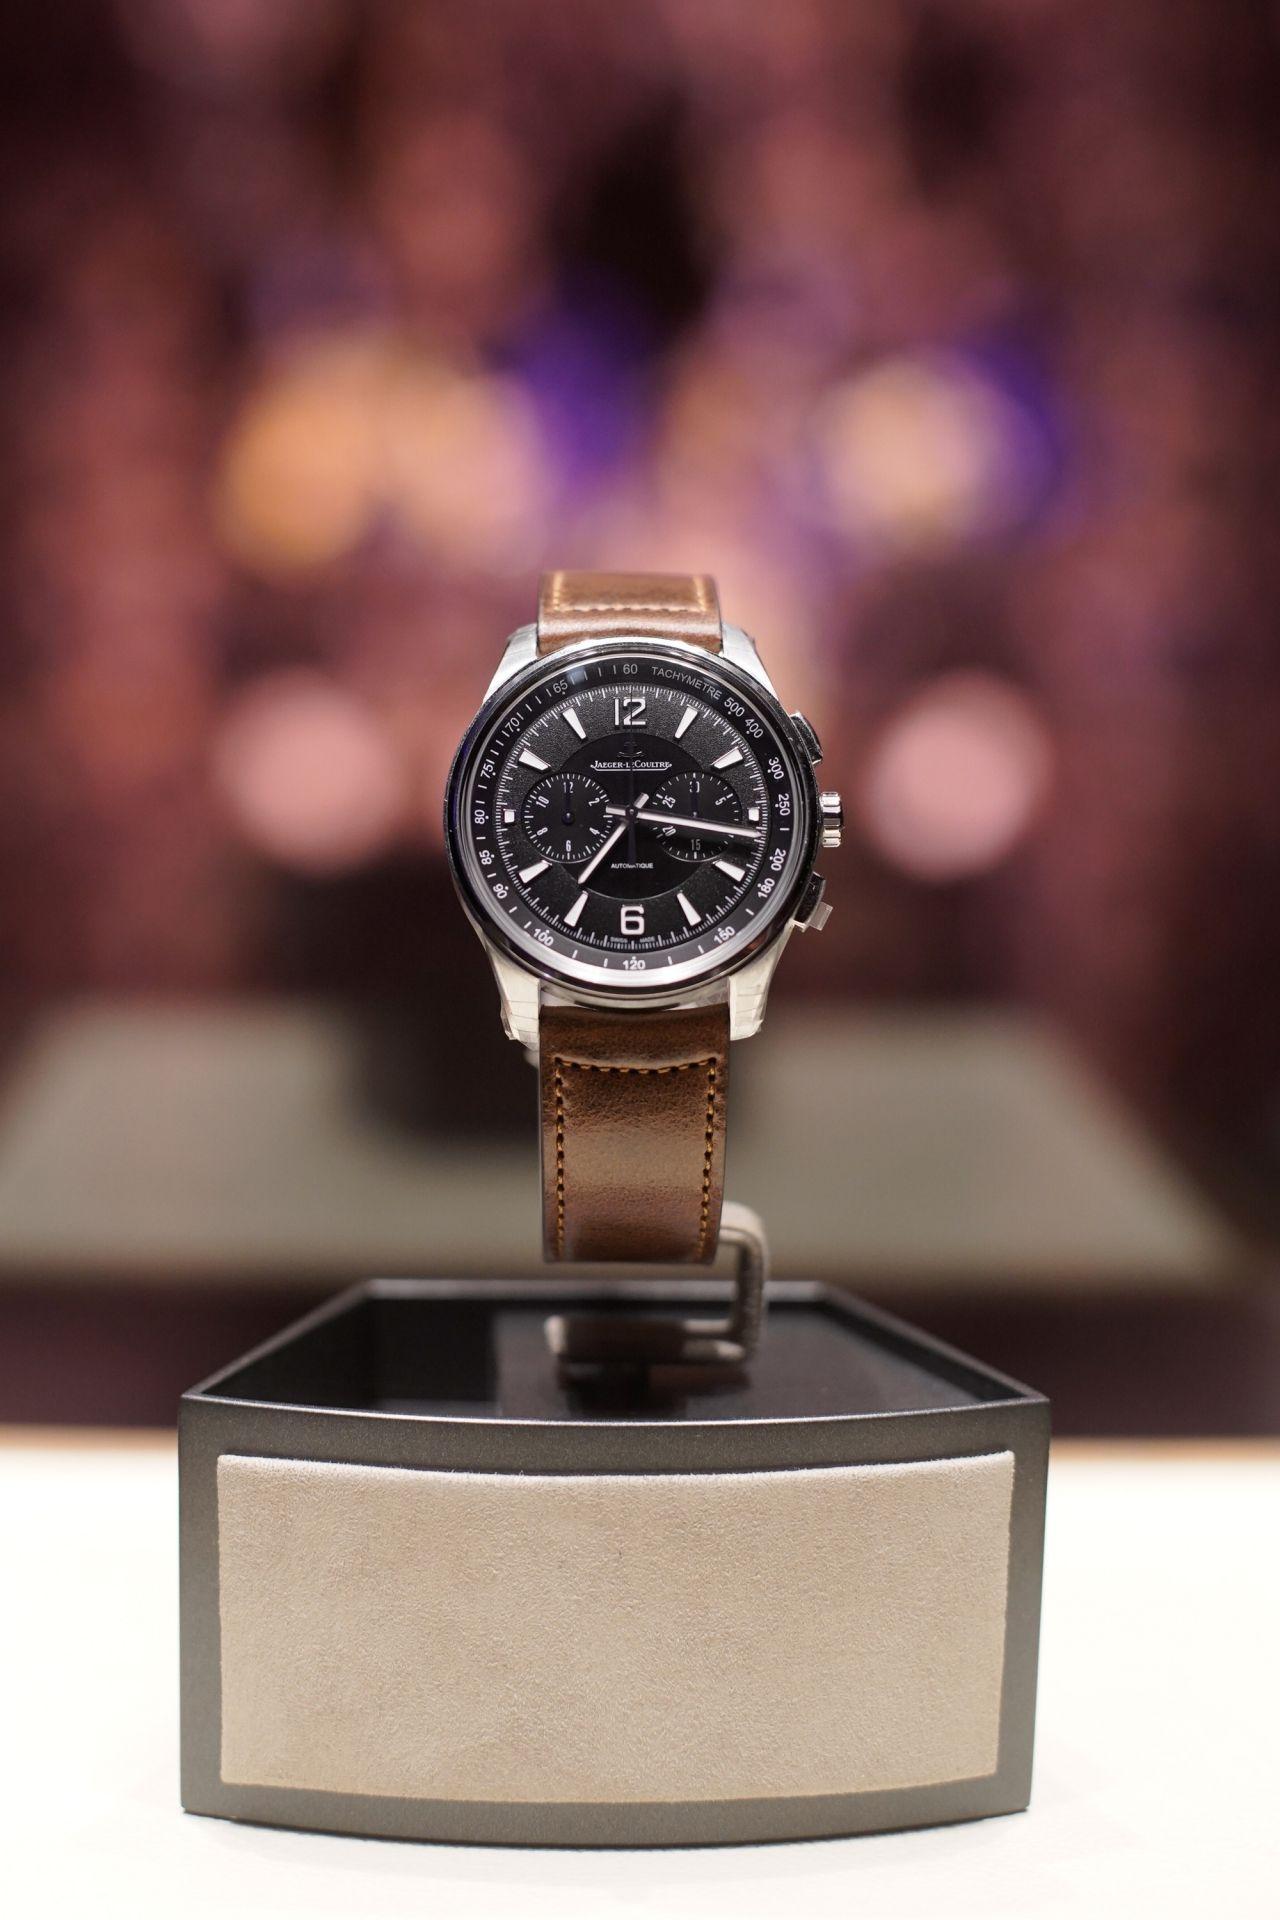 Jaeger-LeCoultre Polaris Chronograph